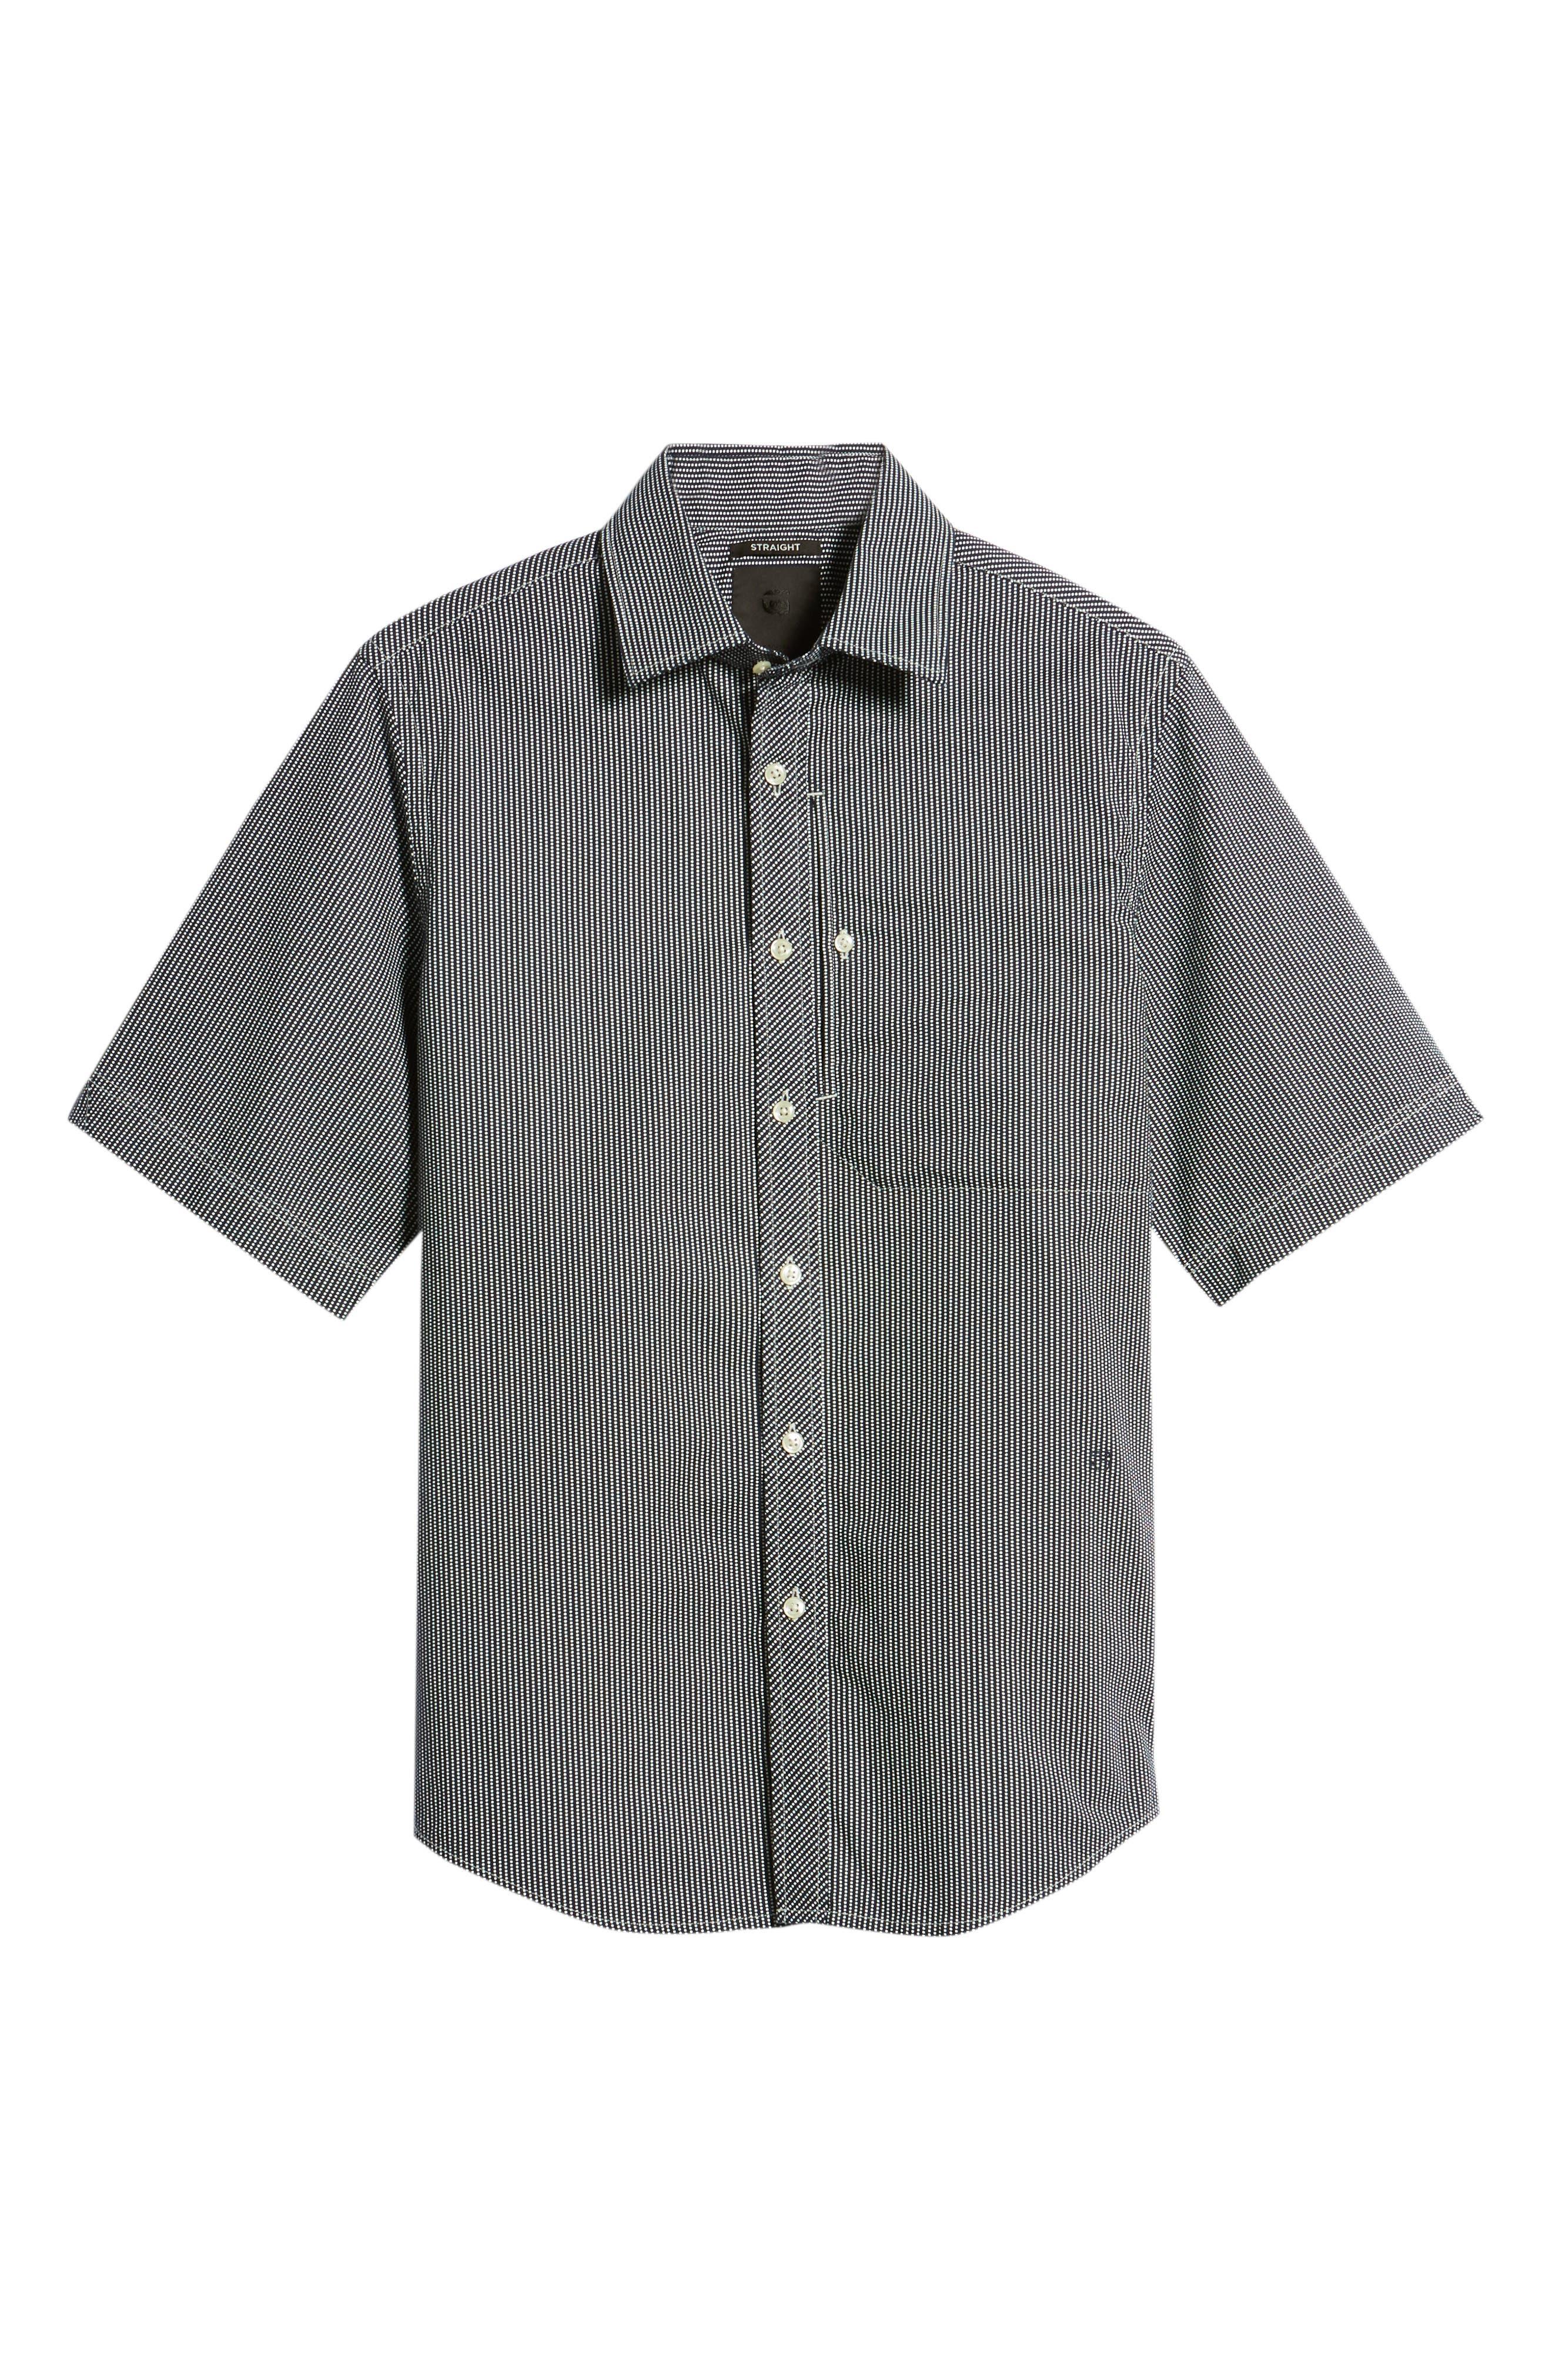 Bristum Straight Ref Shirt,                             Alternate thumbnail 6, color,                             Sartho Blue/ Milk